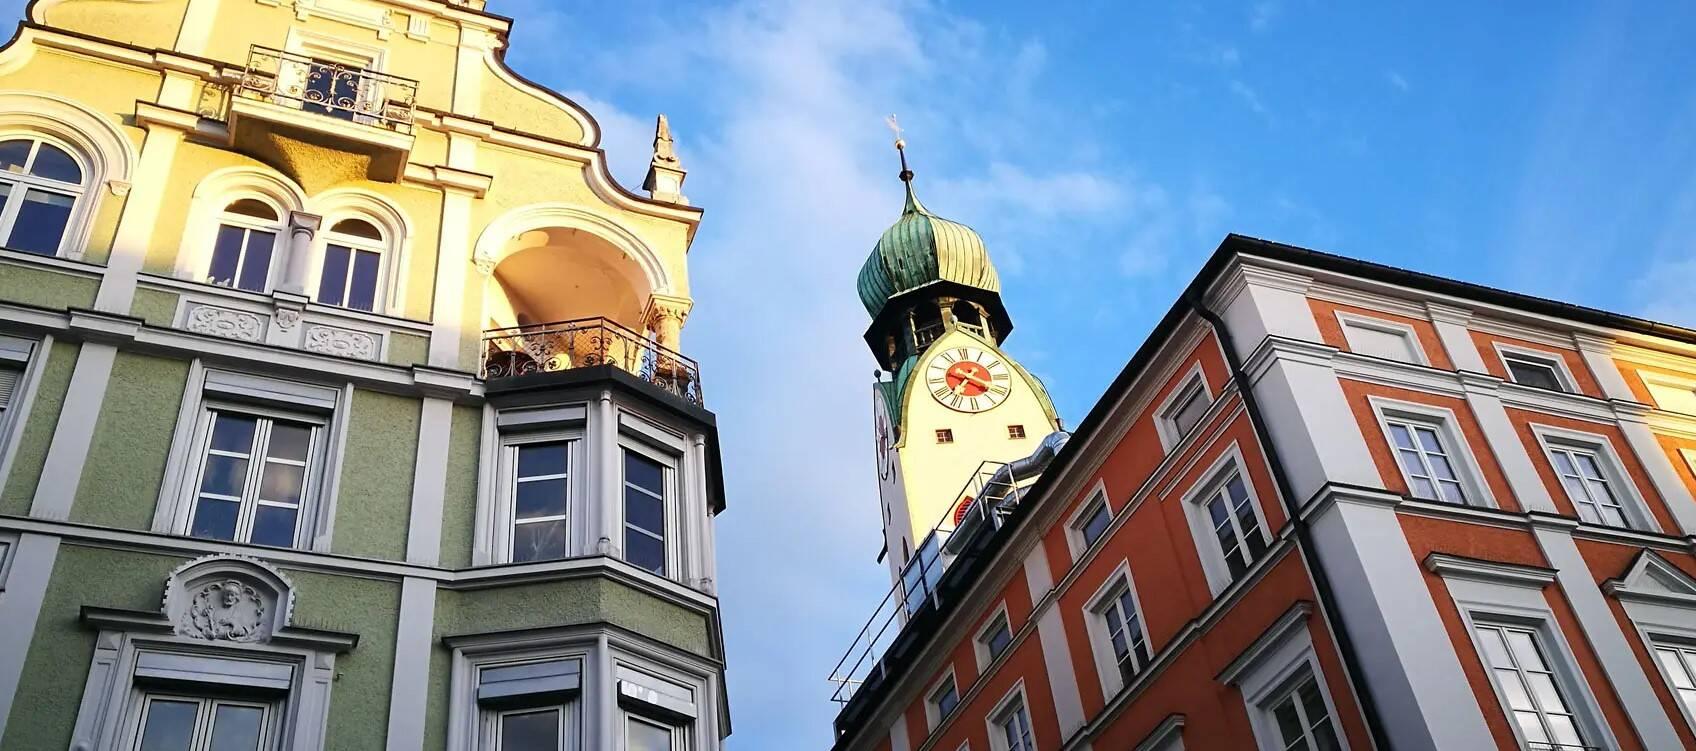 immobilien-makler-rosenheim-chiemgau-stadtbild-kirche-banner01 - Kopie